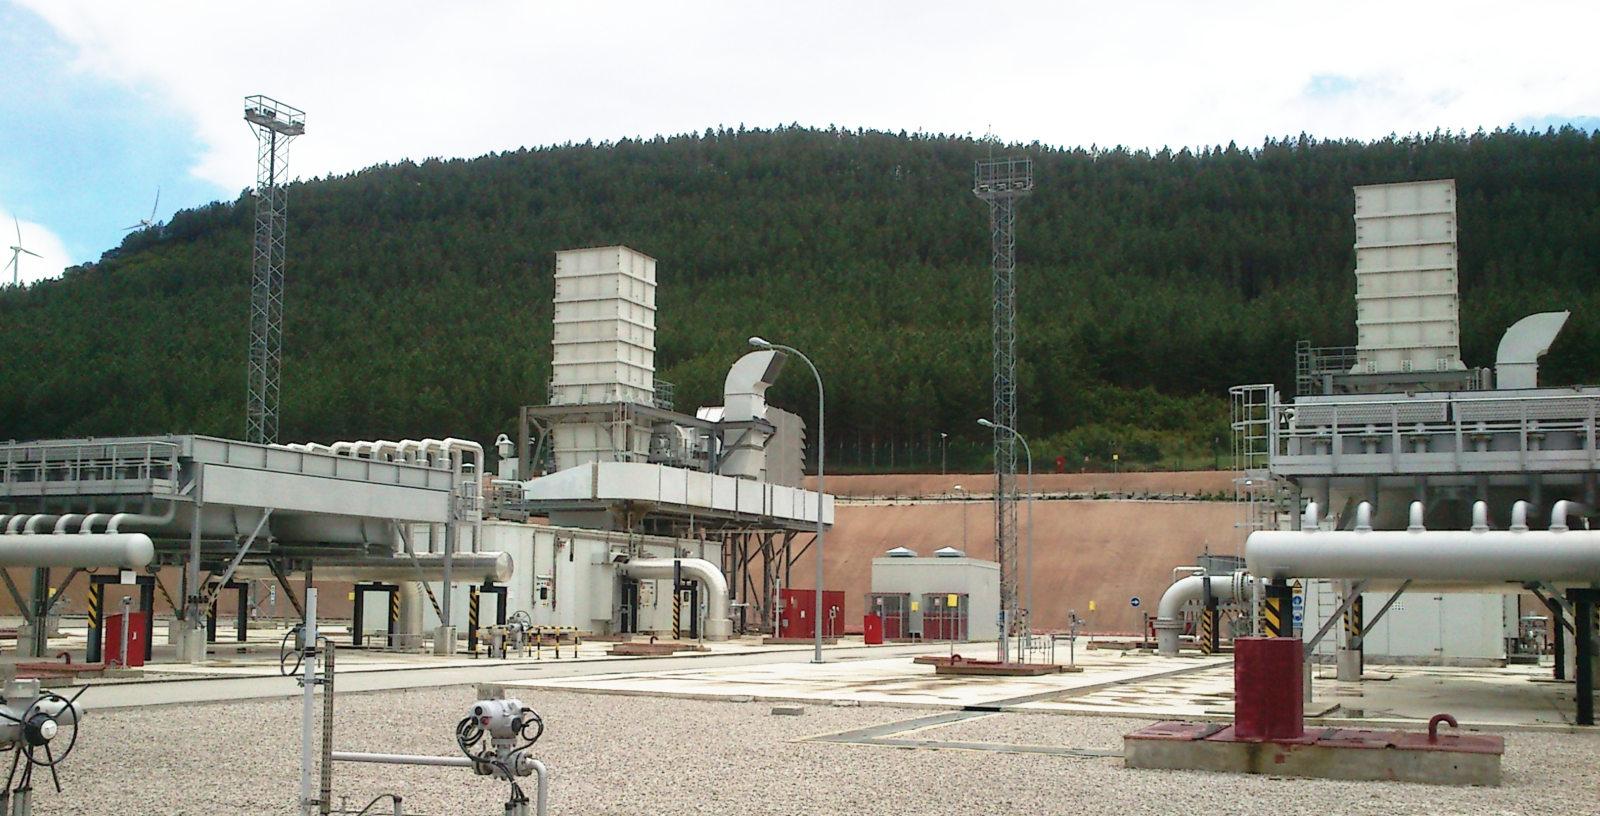 Lumbier_Compression_Station_Spain_Enagas_IDOM_001